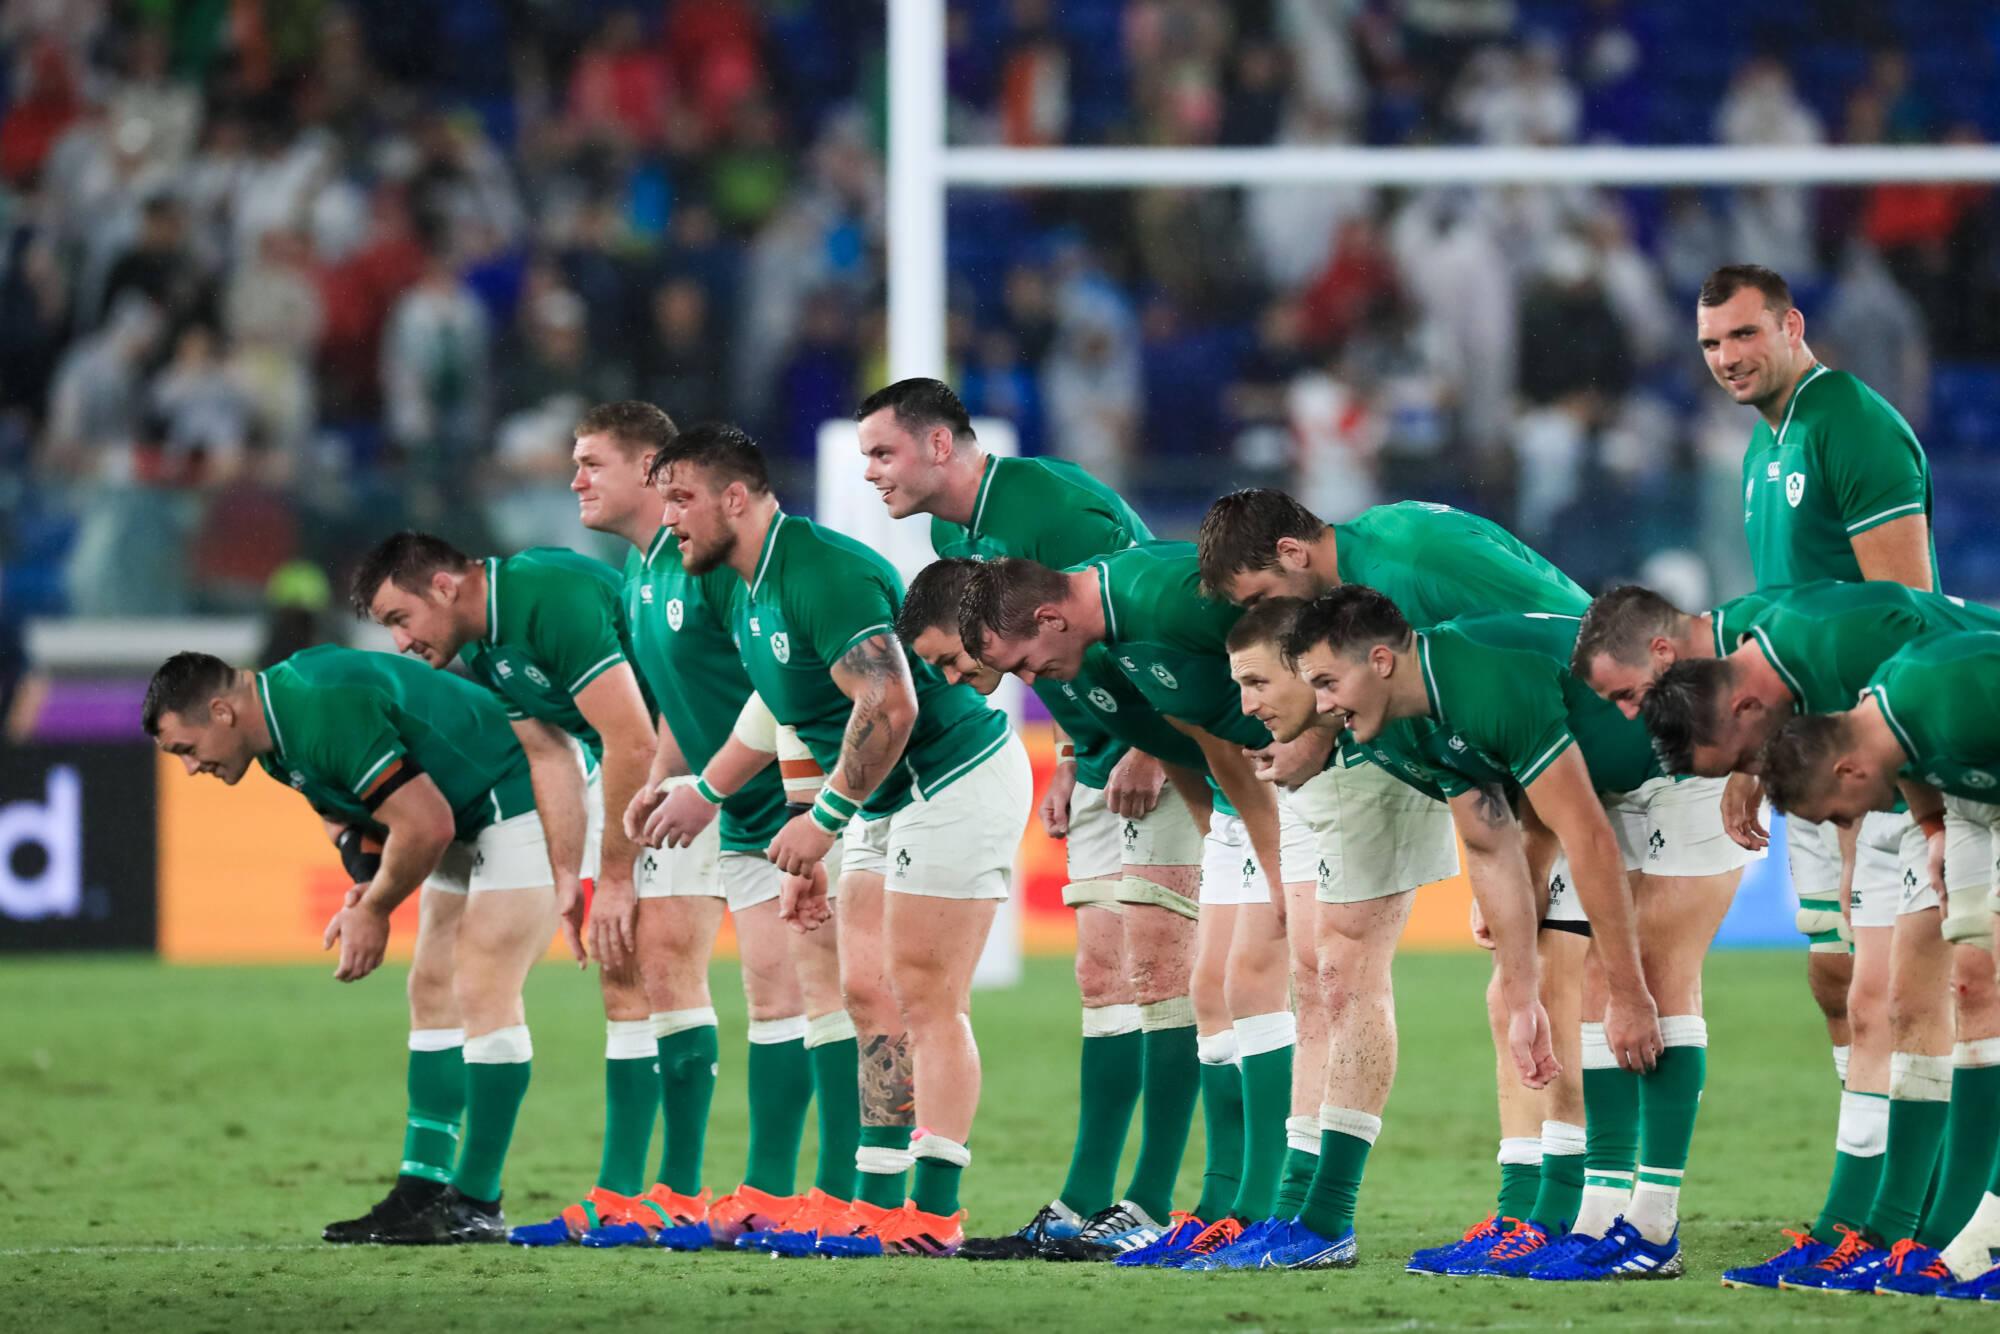 Ecosse-irlande-6-nations-fans